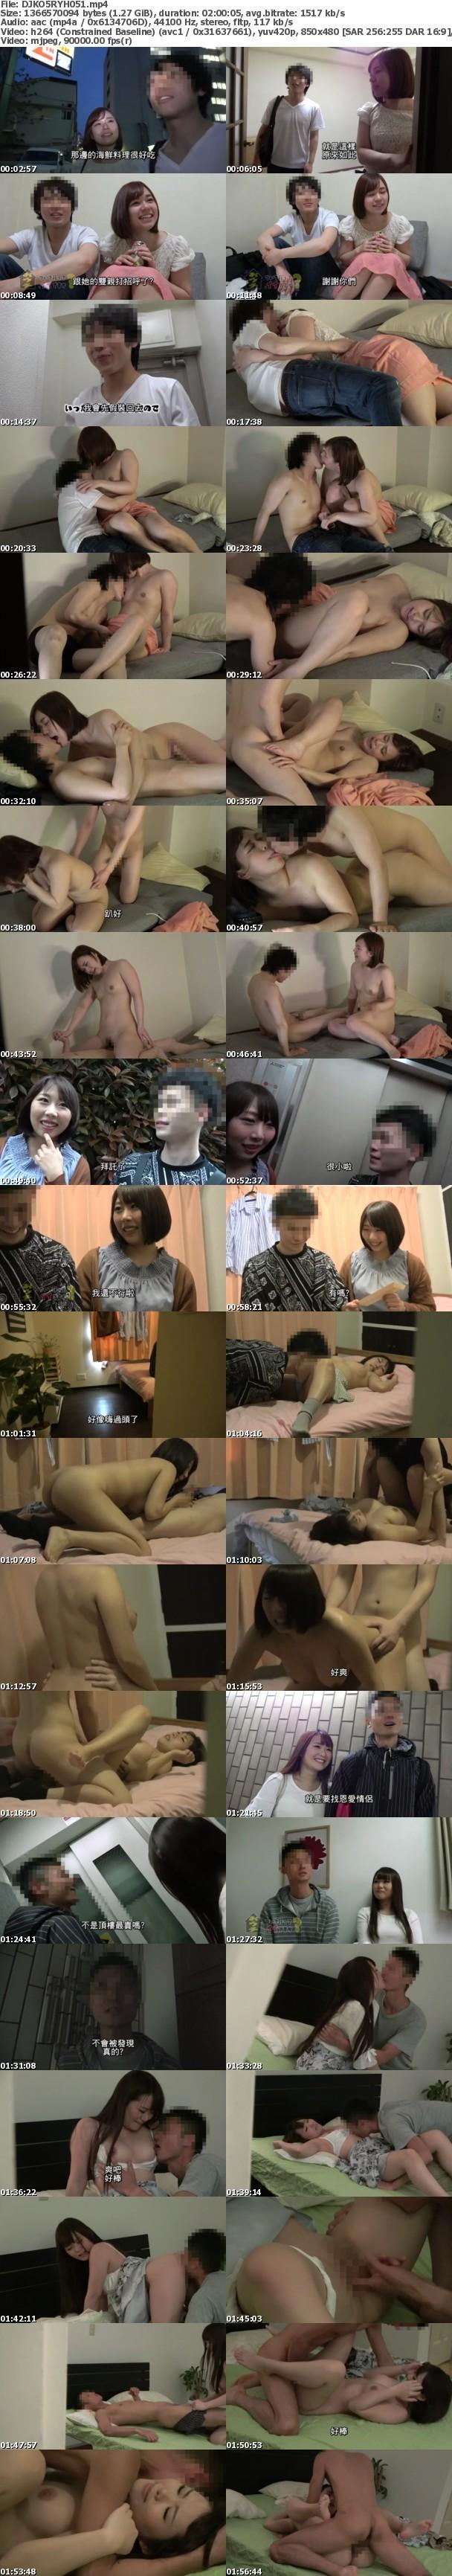 MRXD-051 東京,池袋 情侶被偷拍!?對恩愛的情侶說【可以去你家拜訪嘛】到家裡之後悄悄的偷窺他女朋友做愛的樣子[中文字幕]